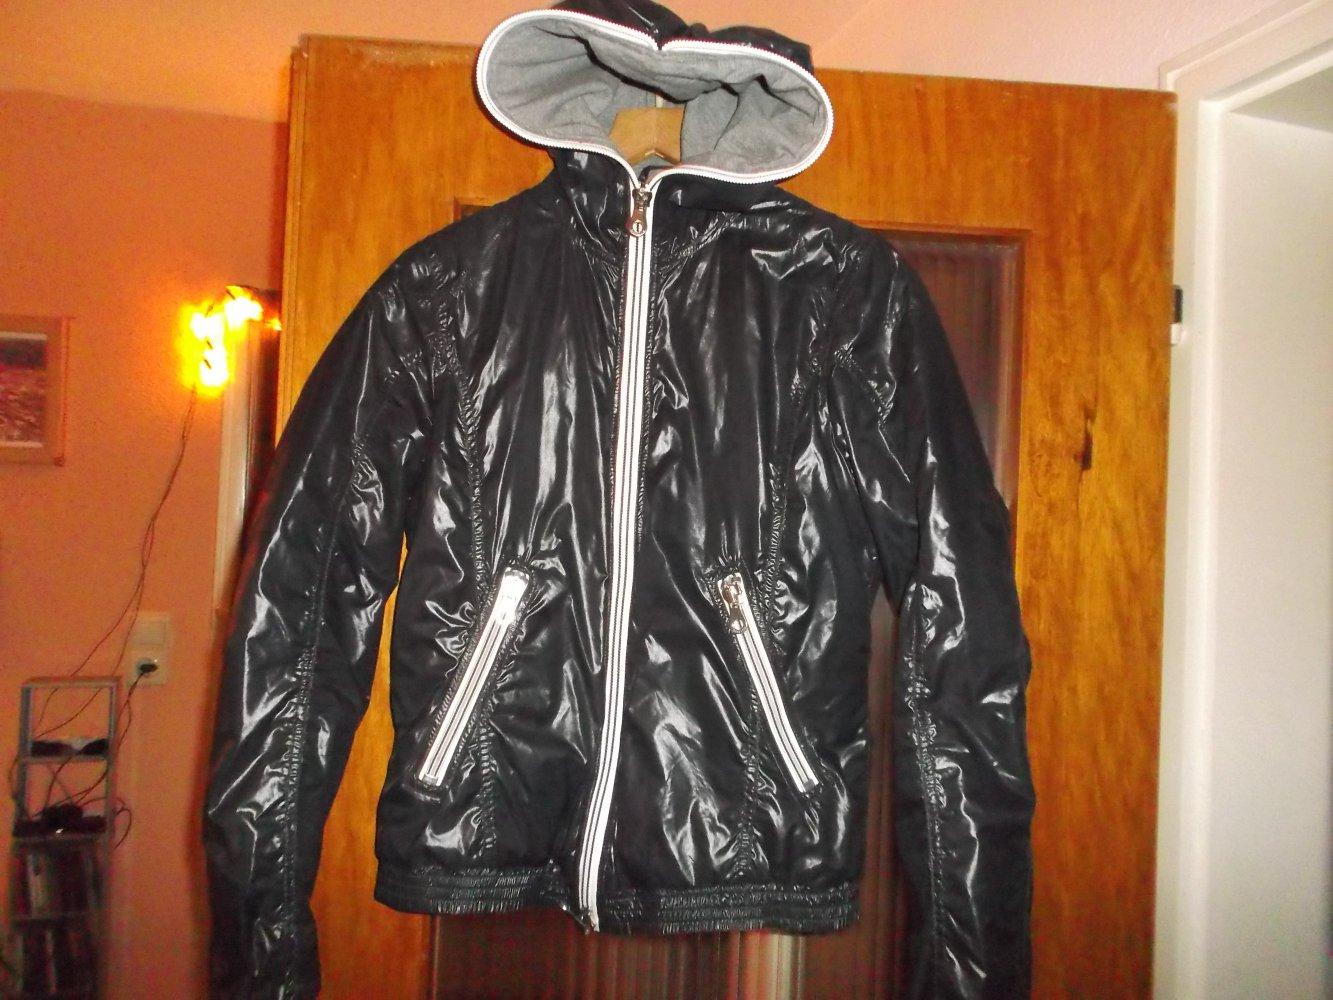 reputable site ab9f2 60102 Original Duvetica Jacke Gr. 38 Neu